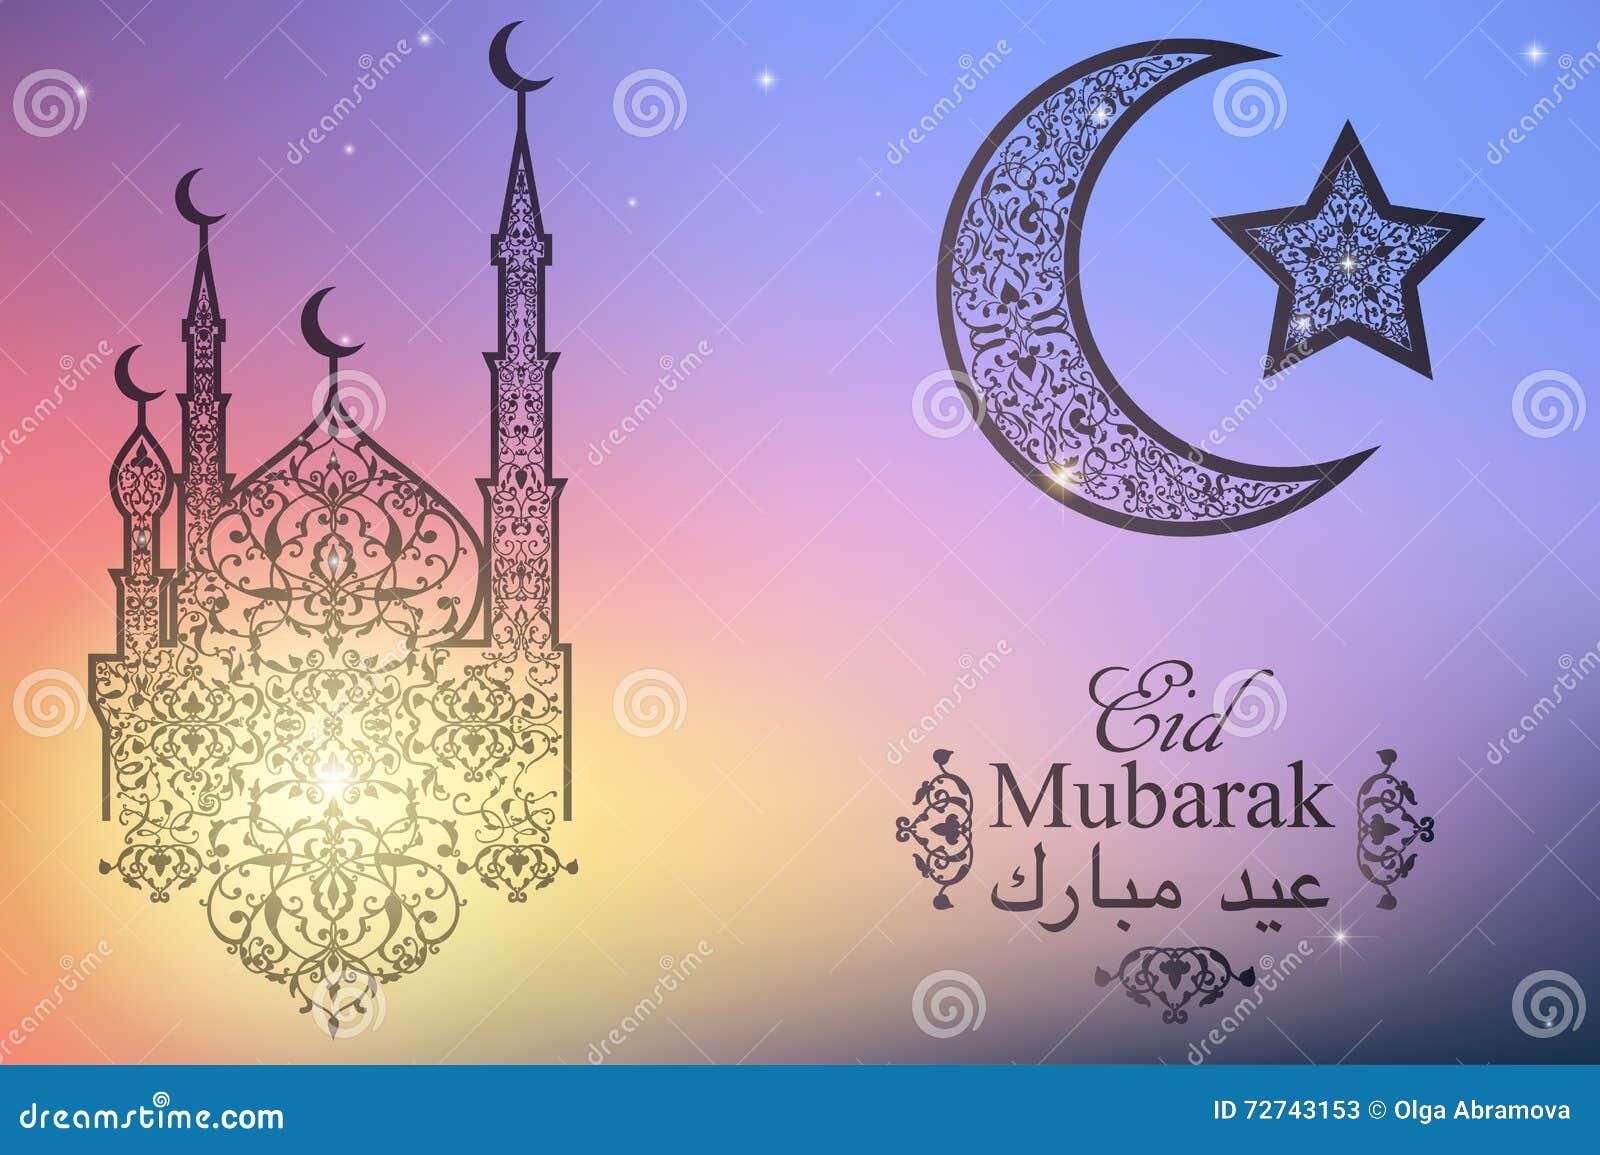 English Translate Eid Mubarak Beautiful Mosque Crescent And Star